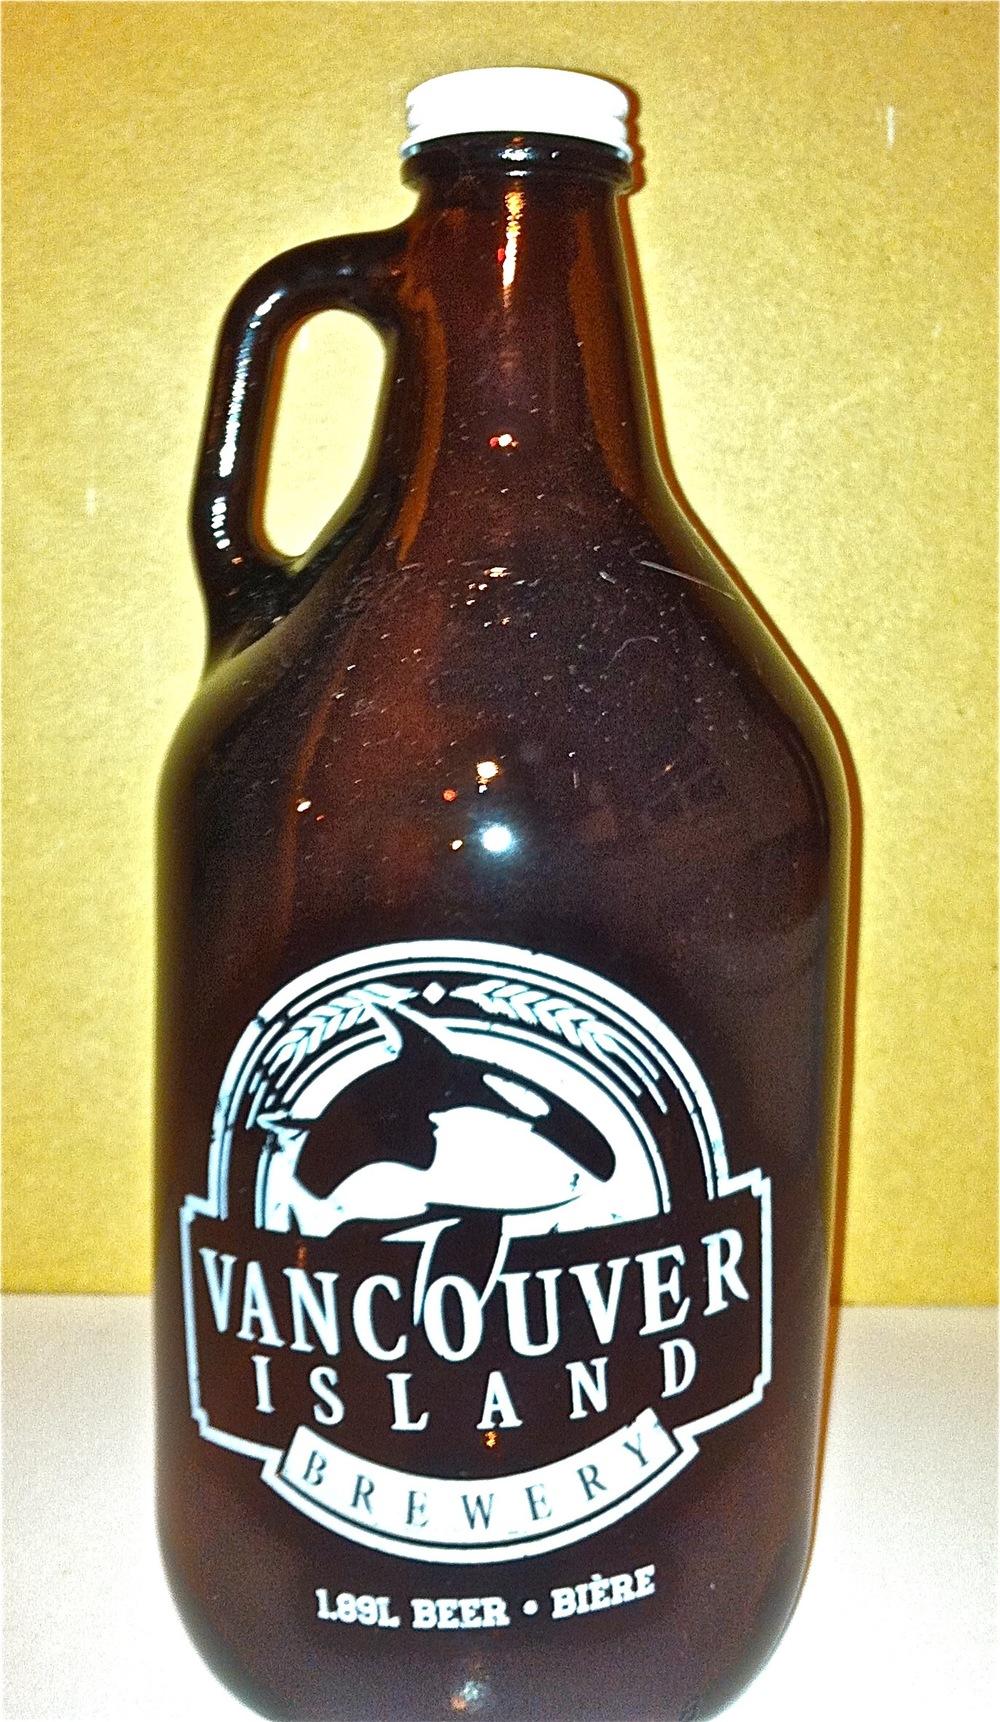 GR - Vancouver Island Brewery.jpg